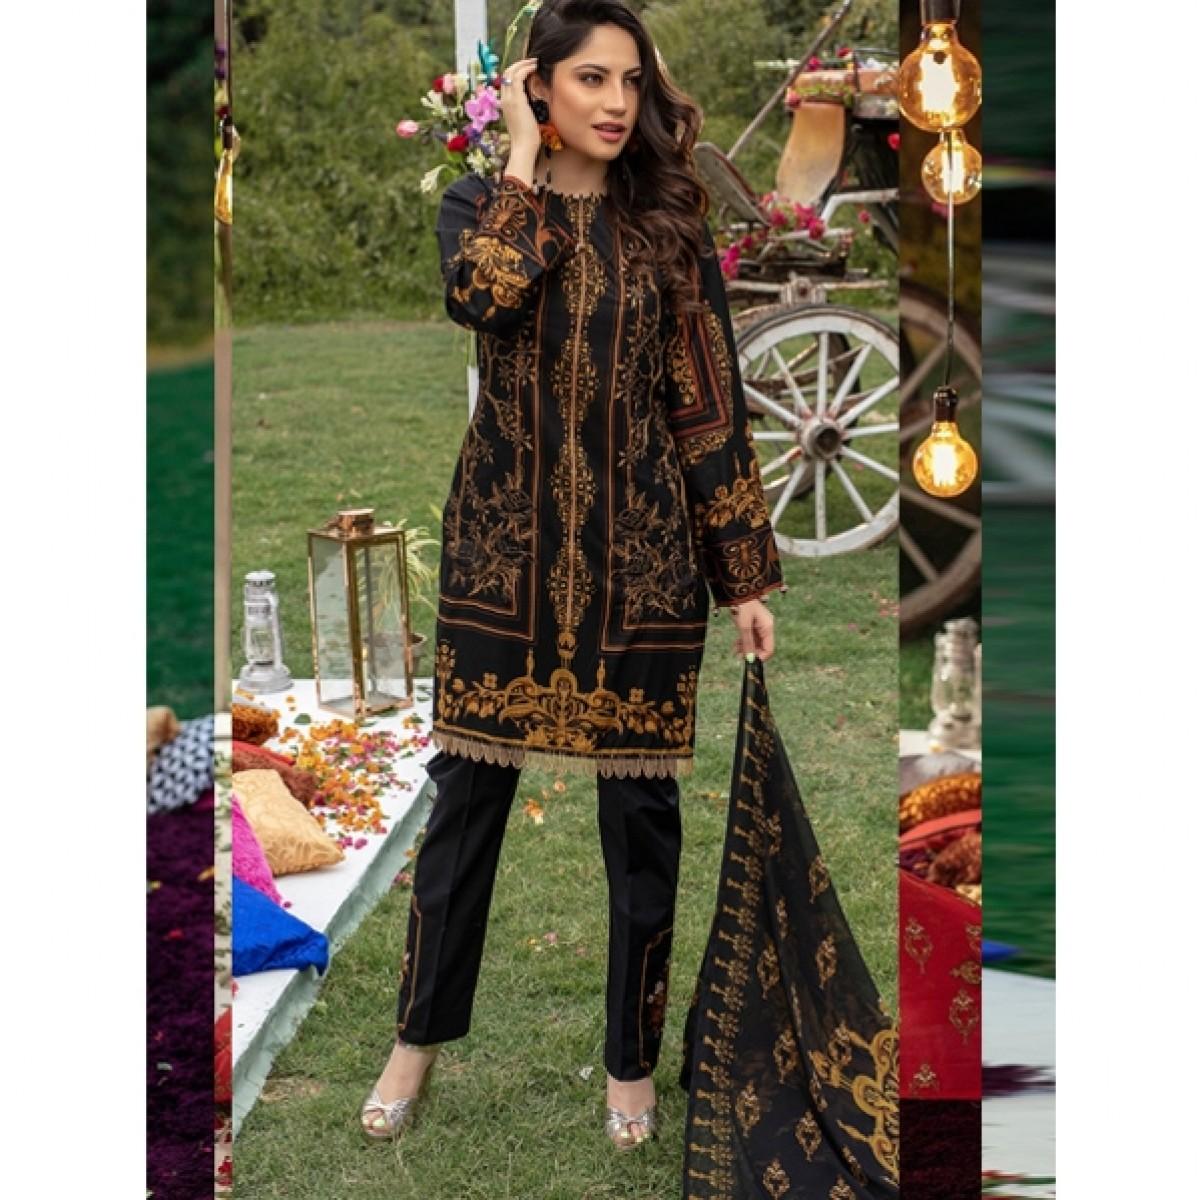 abf4979da1 Salitex Zure Lawn Collection 2019 Vol-2 (WK-258A) Price in Pakistan | Buy  Salitex Zure Embroidered Collection 3 Piece | iShopping.pk